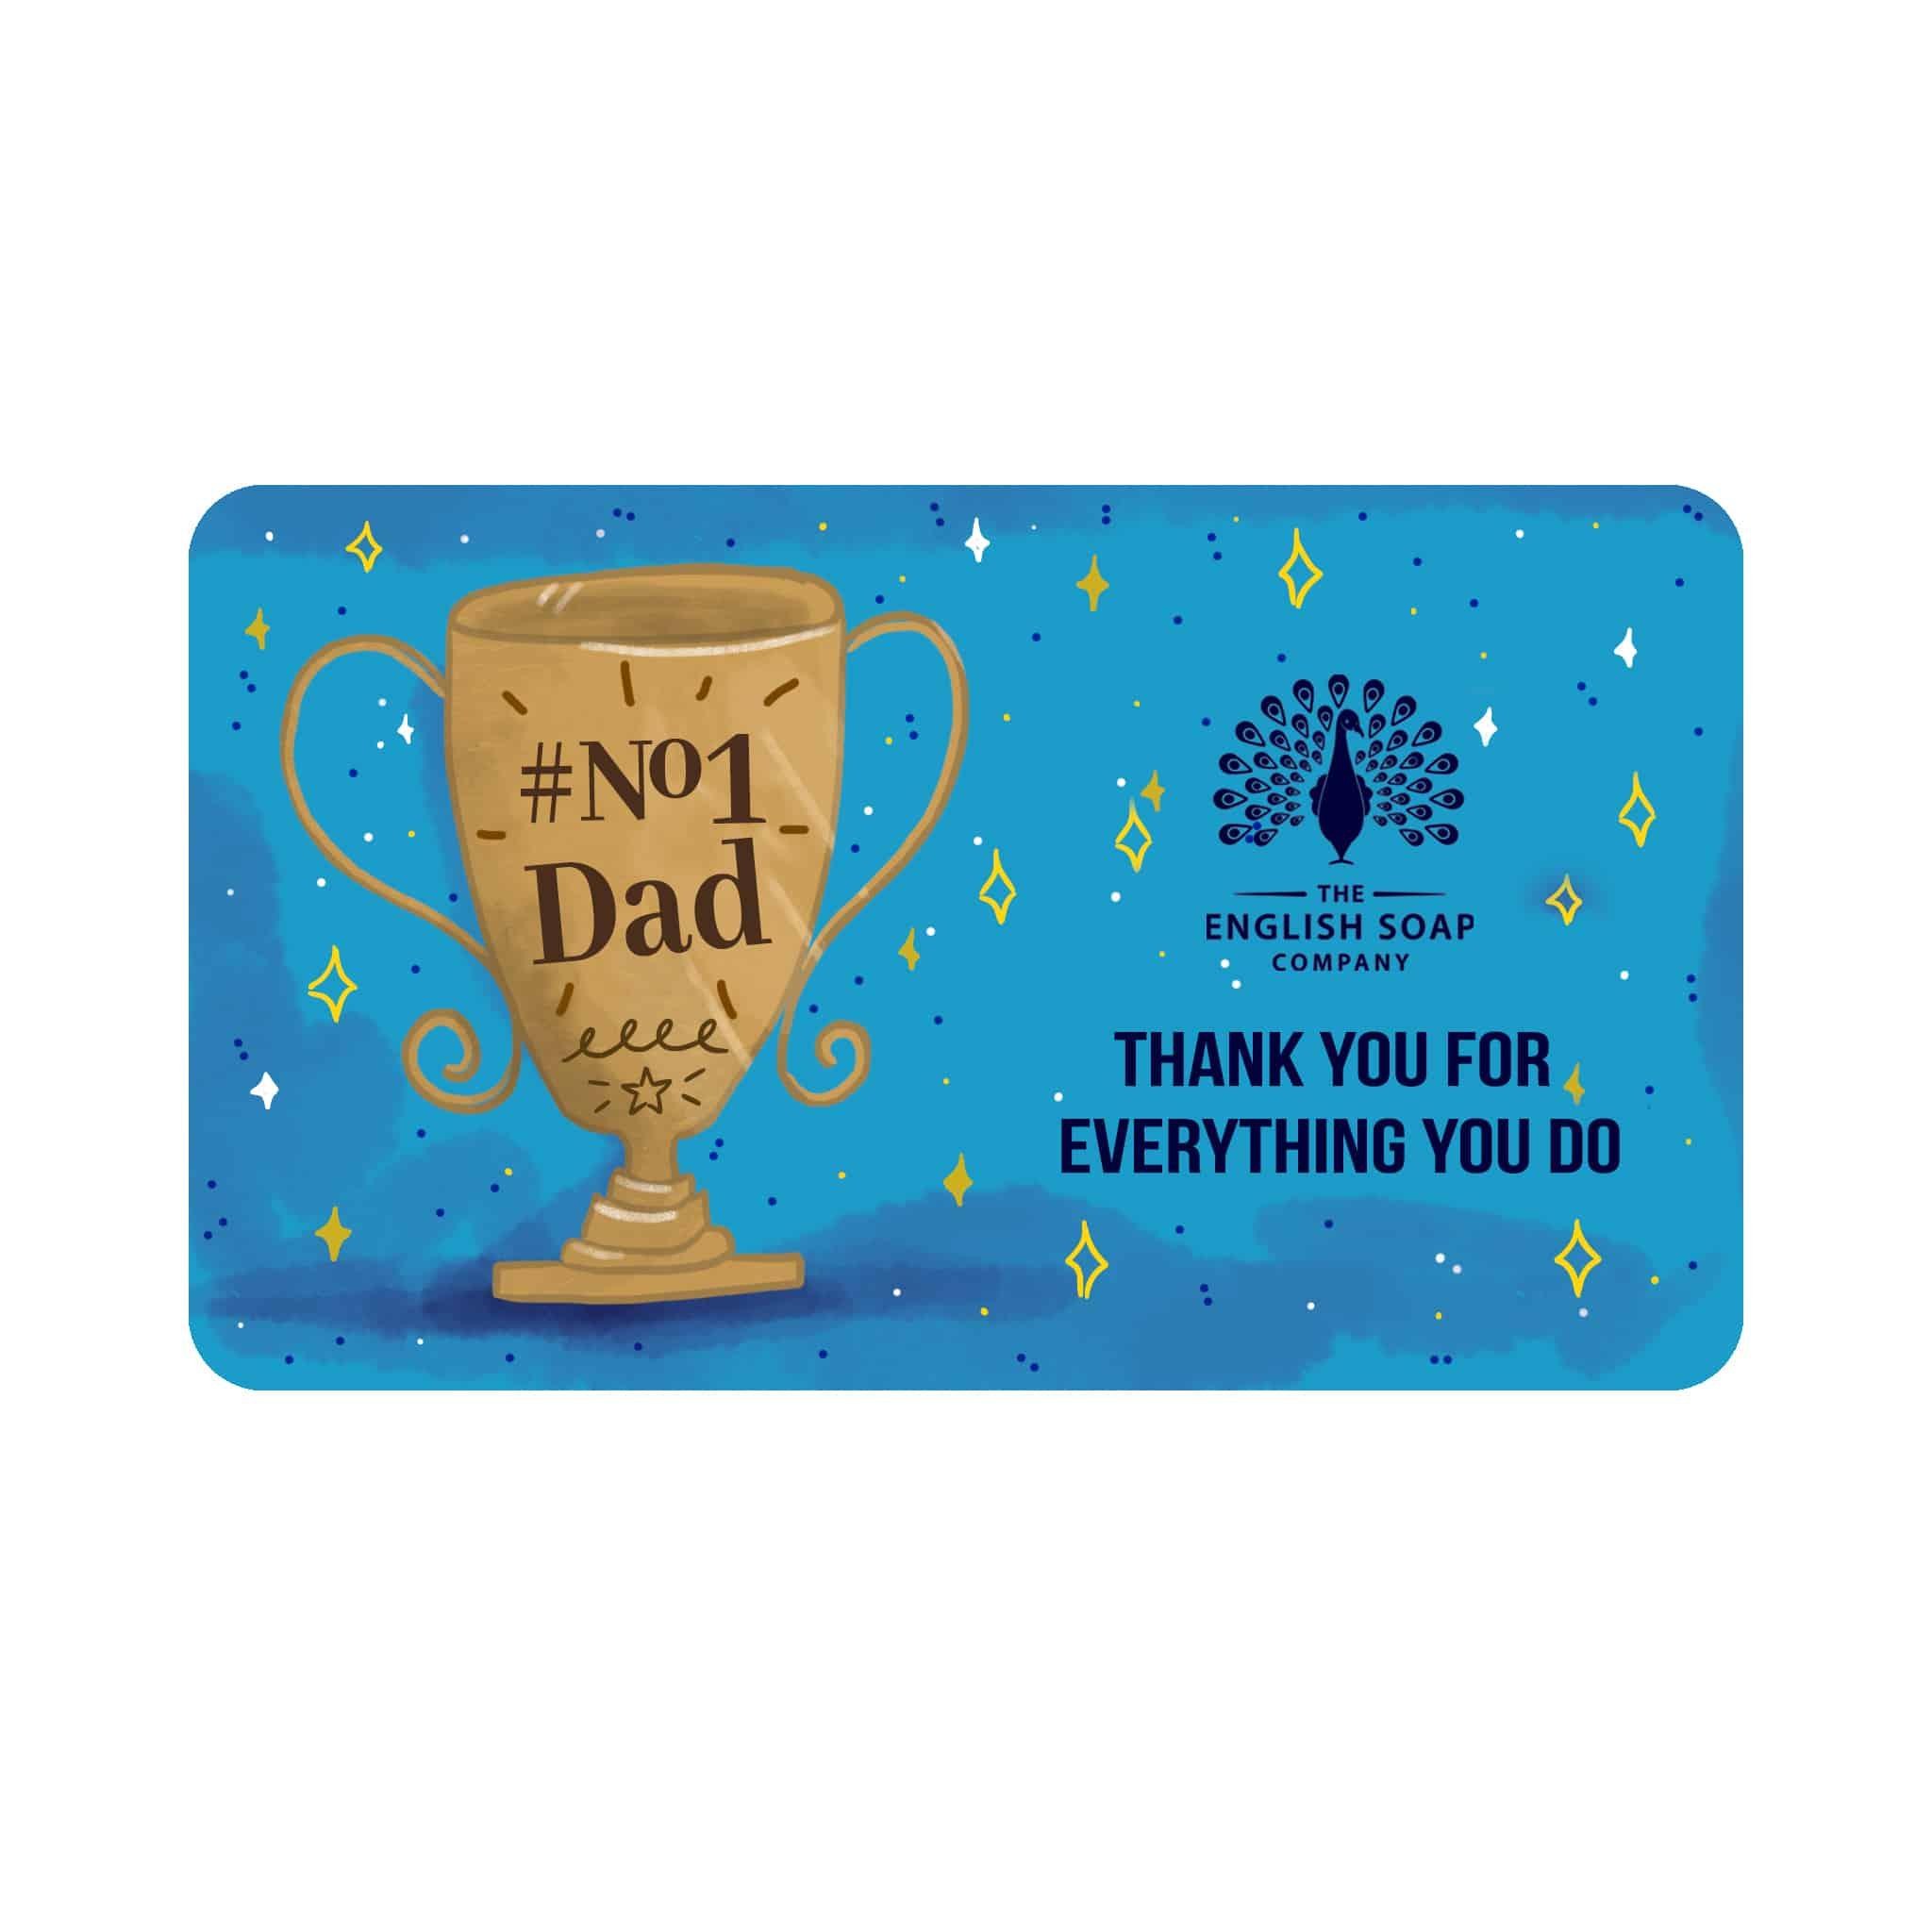 No 1 Dad Online Gift Card